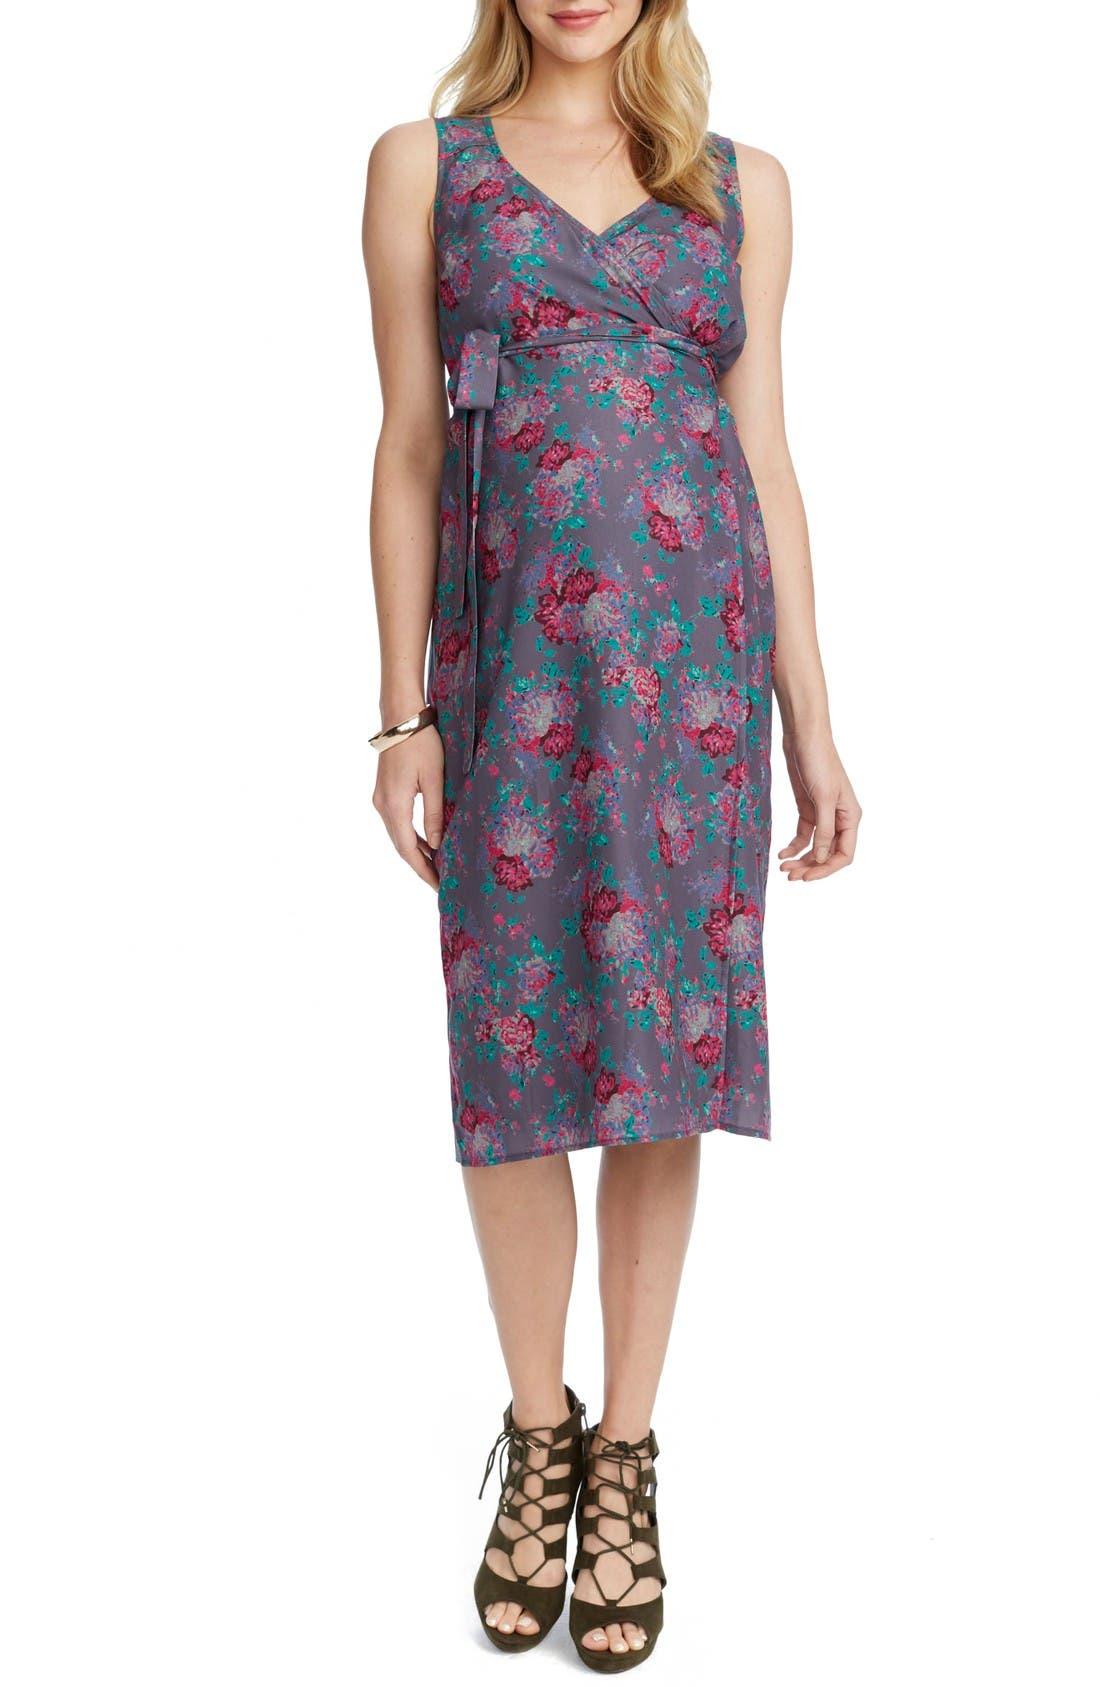 Alternate Image 1 Selected - Rosie Pope Tara Floral Maternity/Nursing Wrap Dress